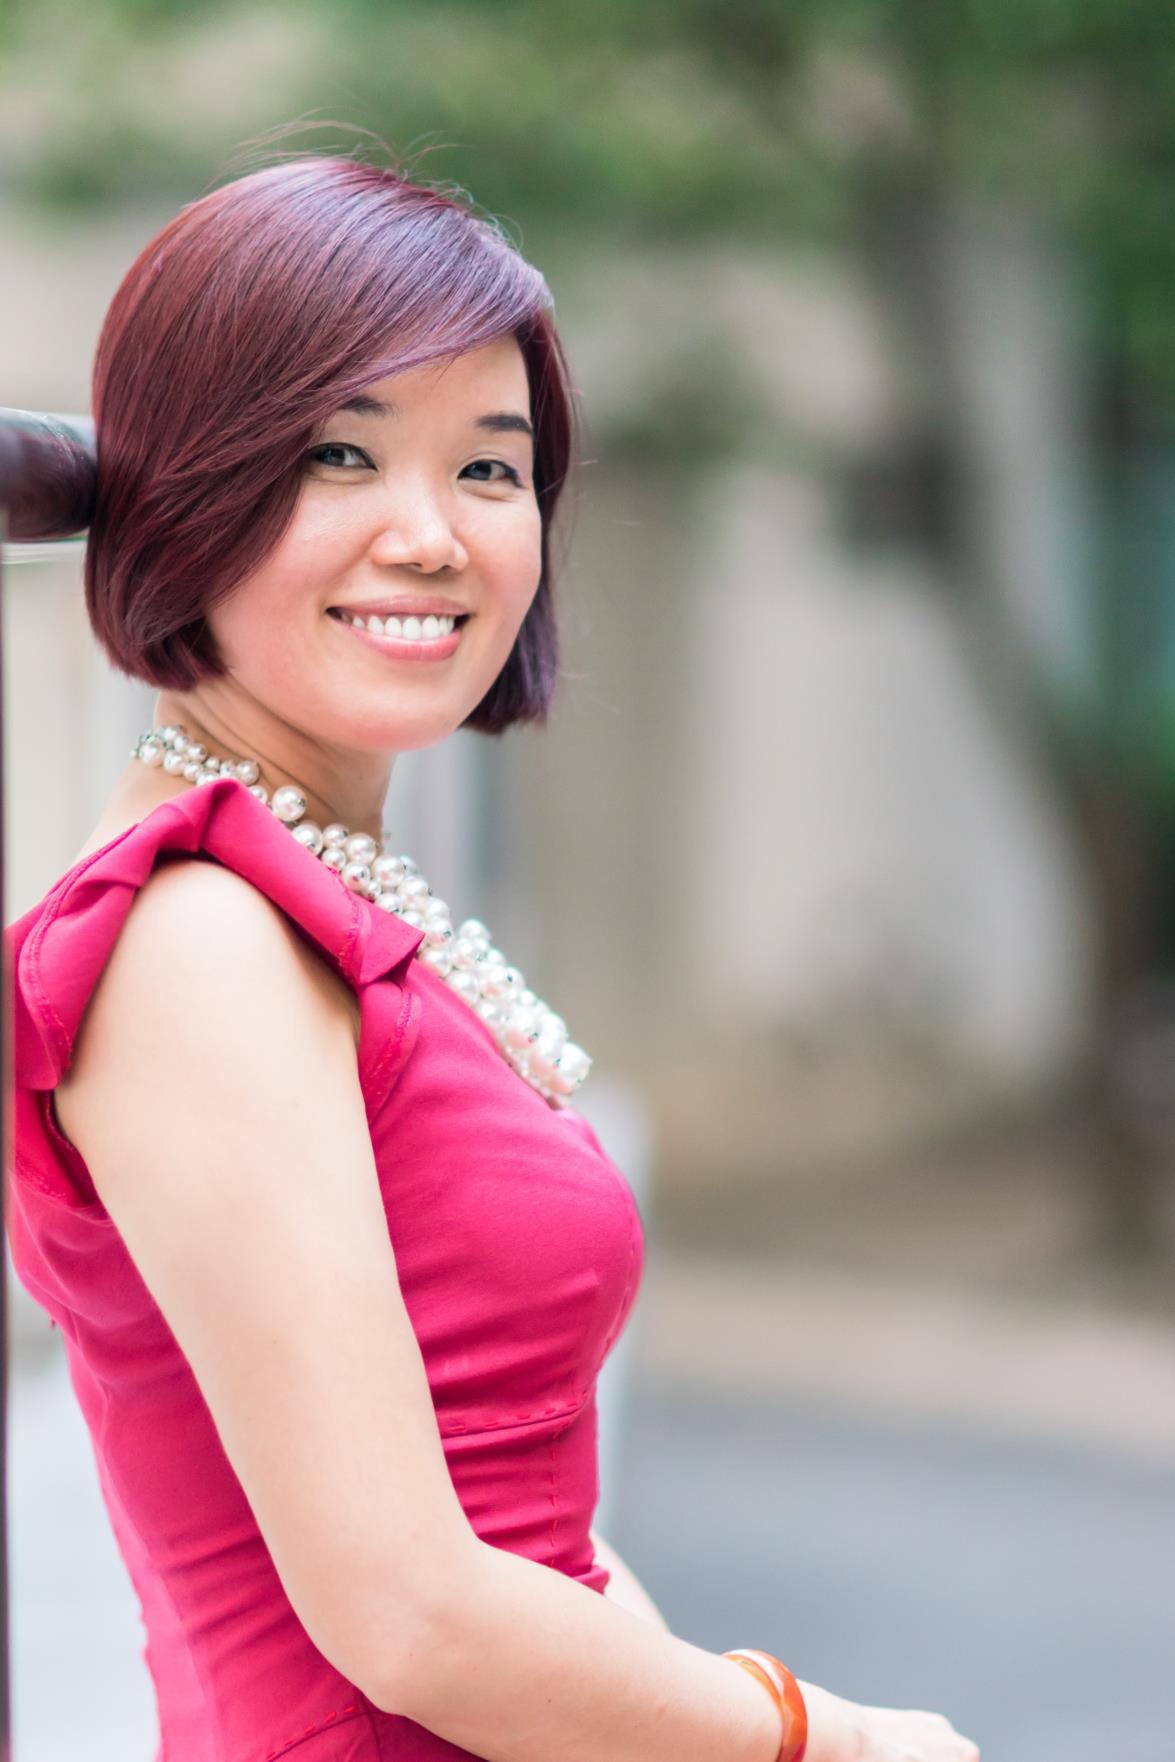 Trinh Thi Thanh Ha